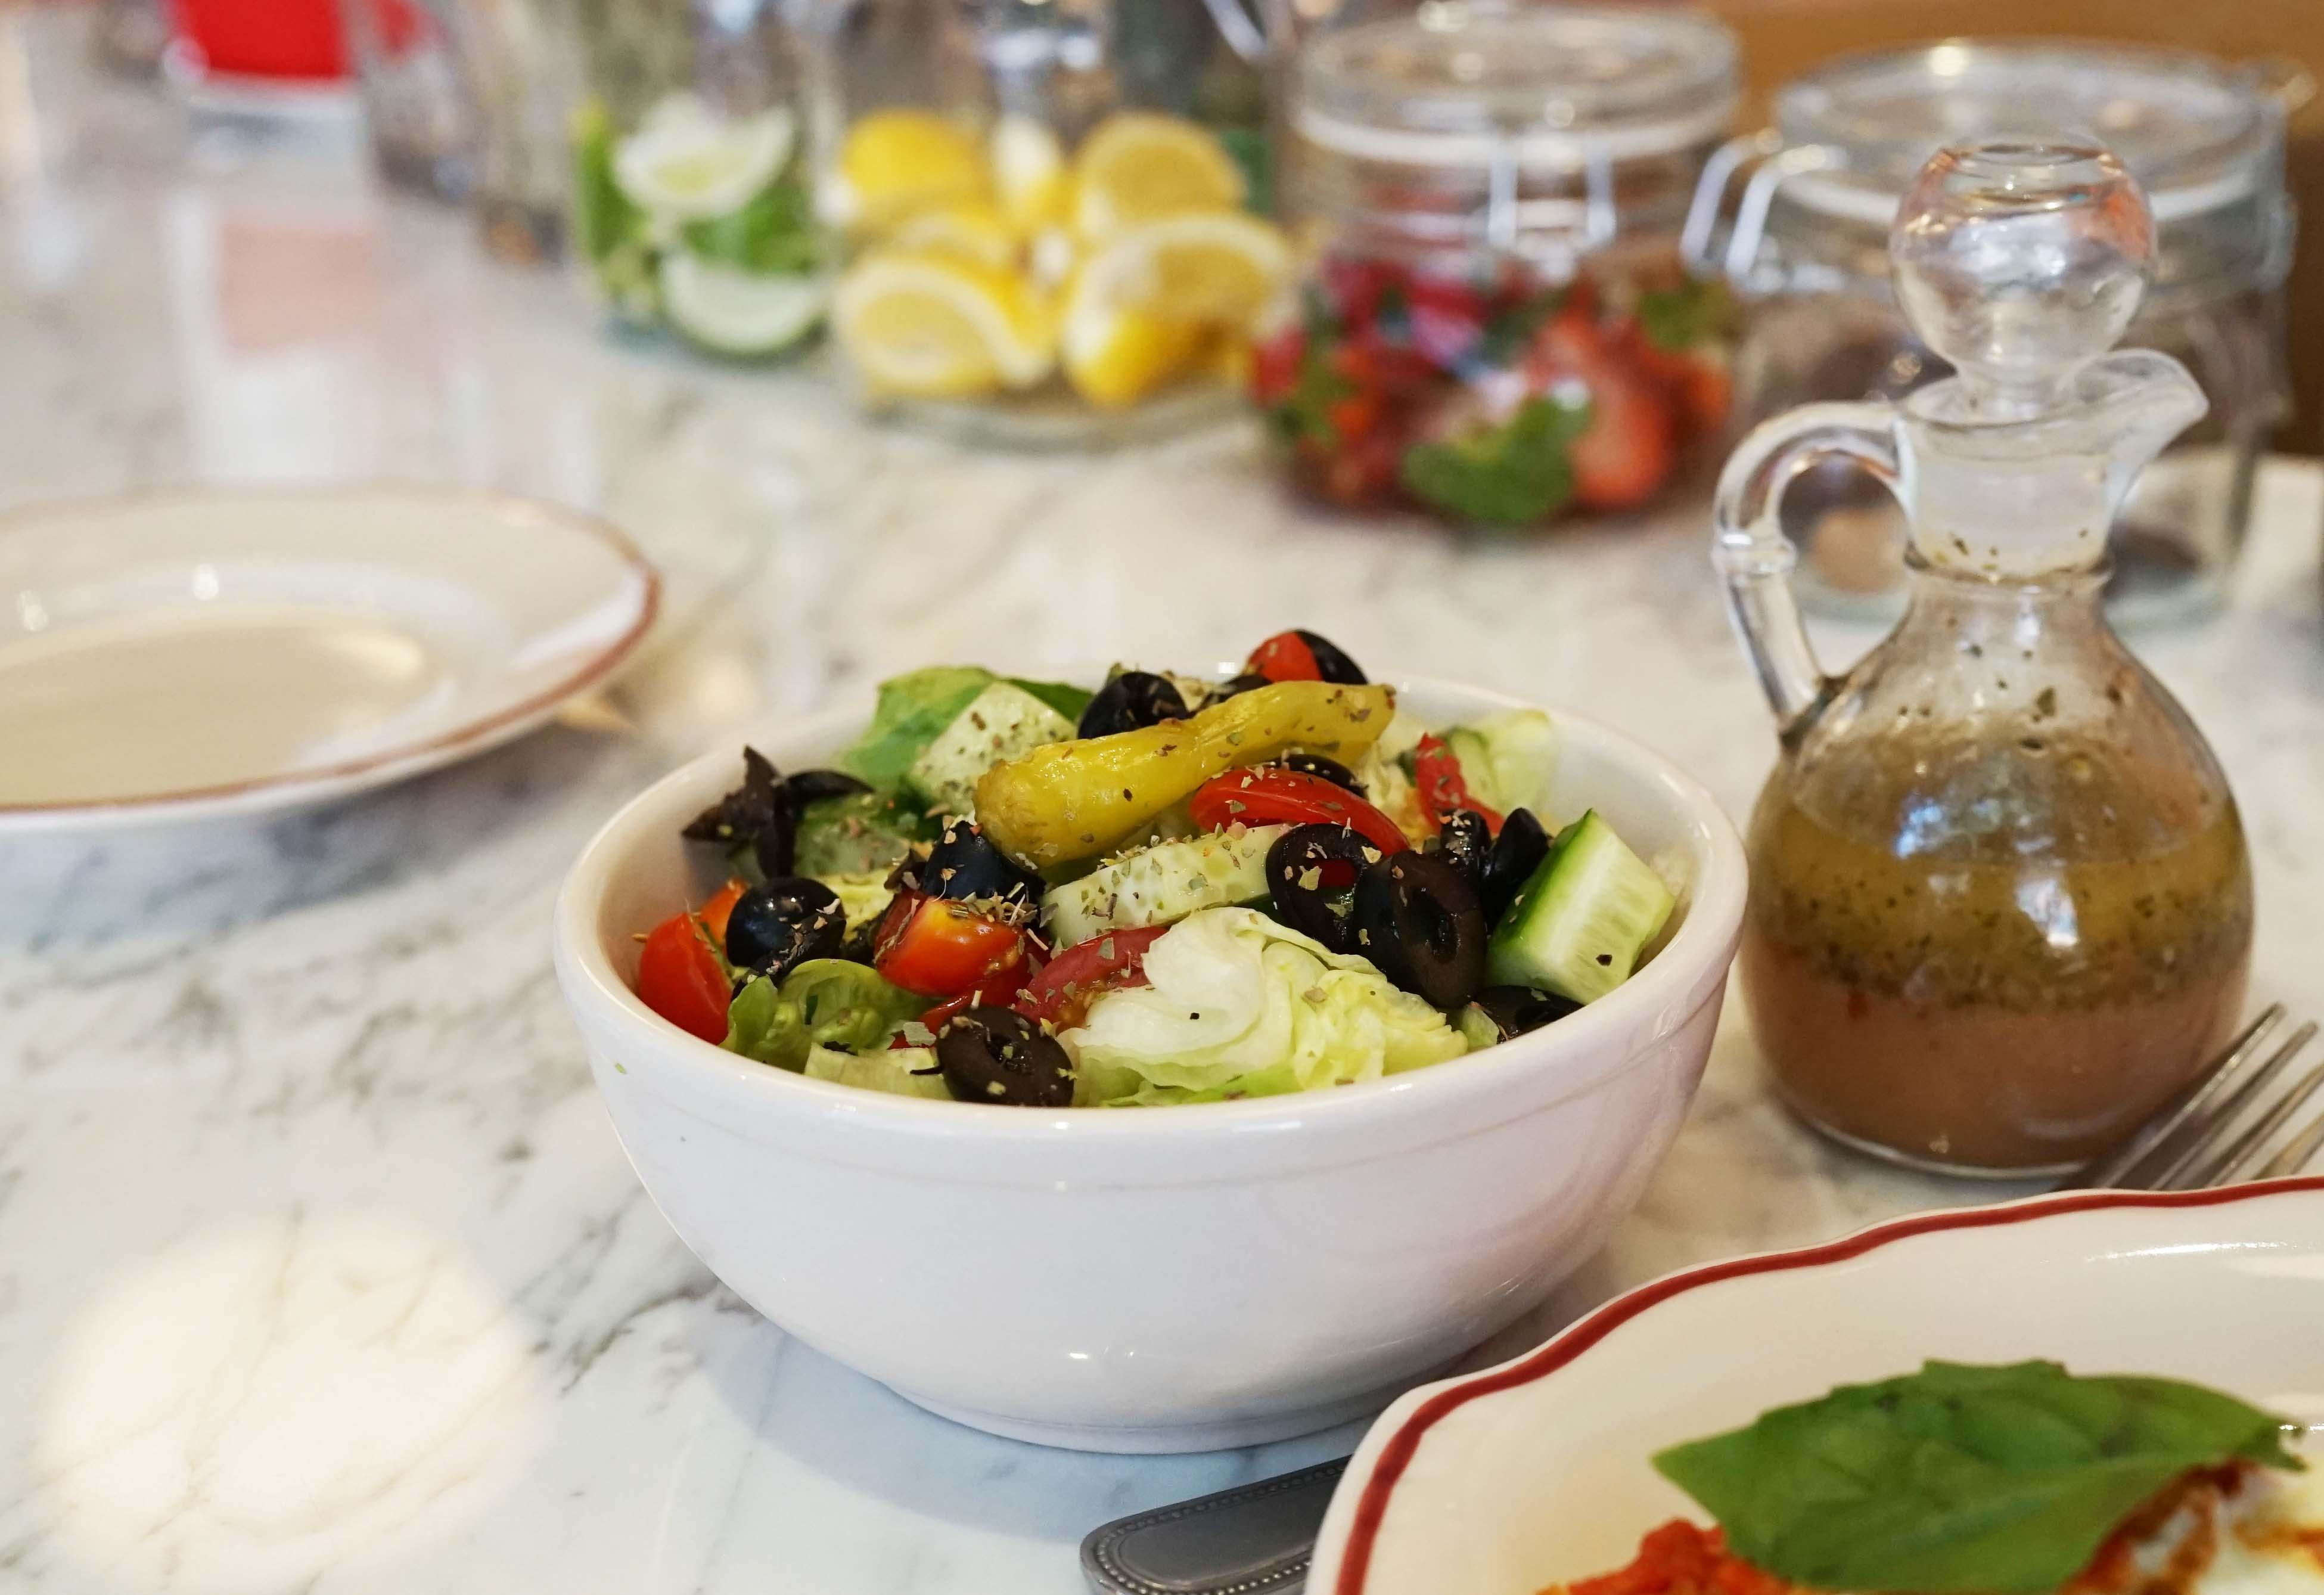 Parm chicken platter salad